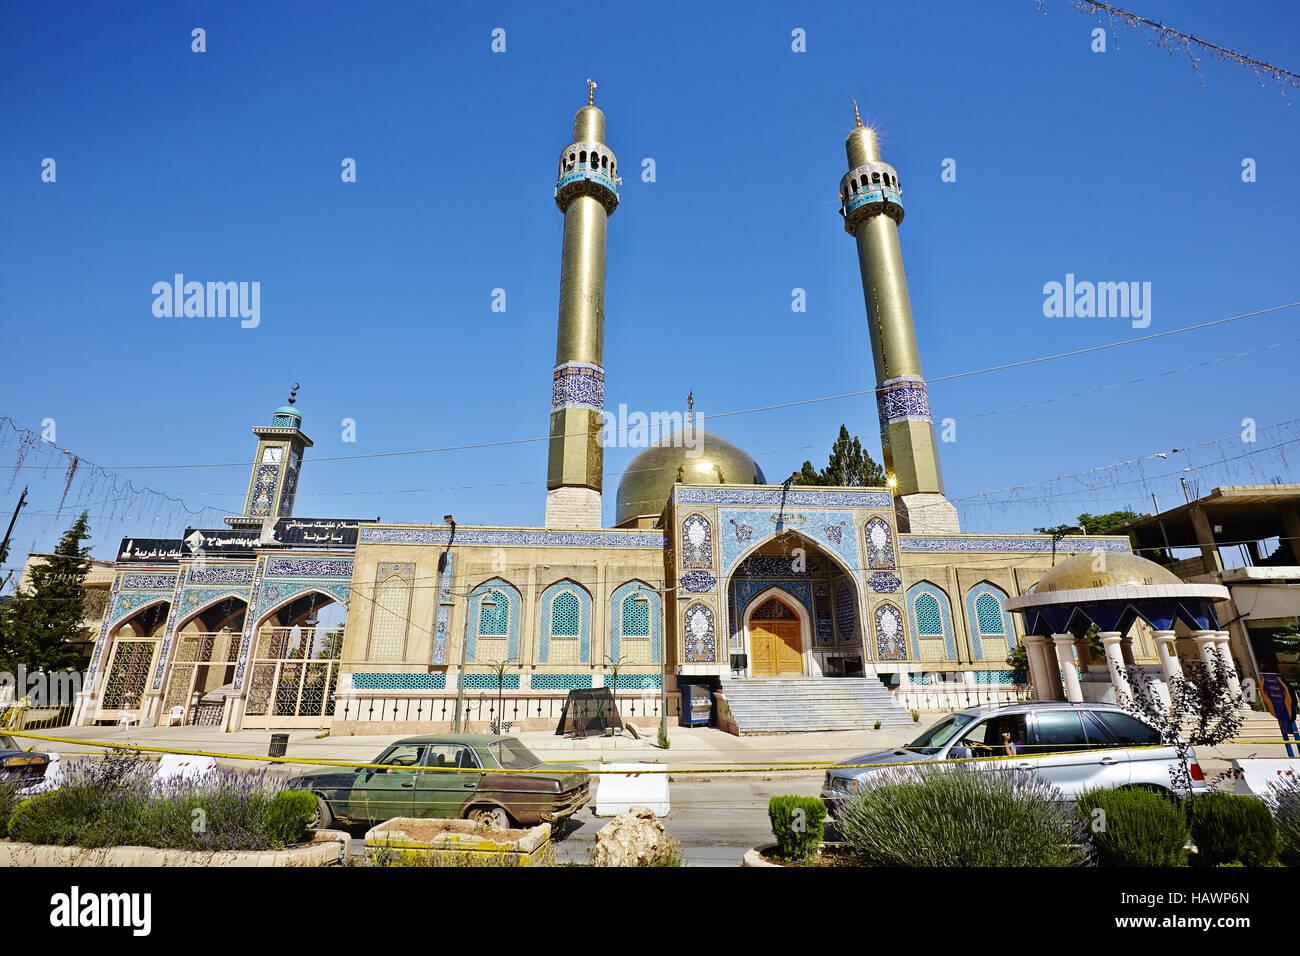 Baalbek, Lebanon. - Stock Image